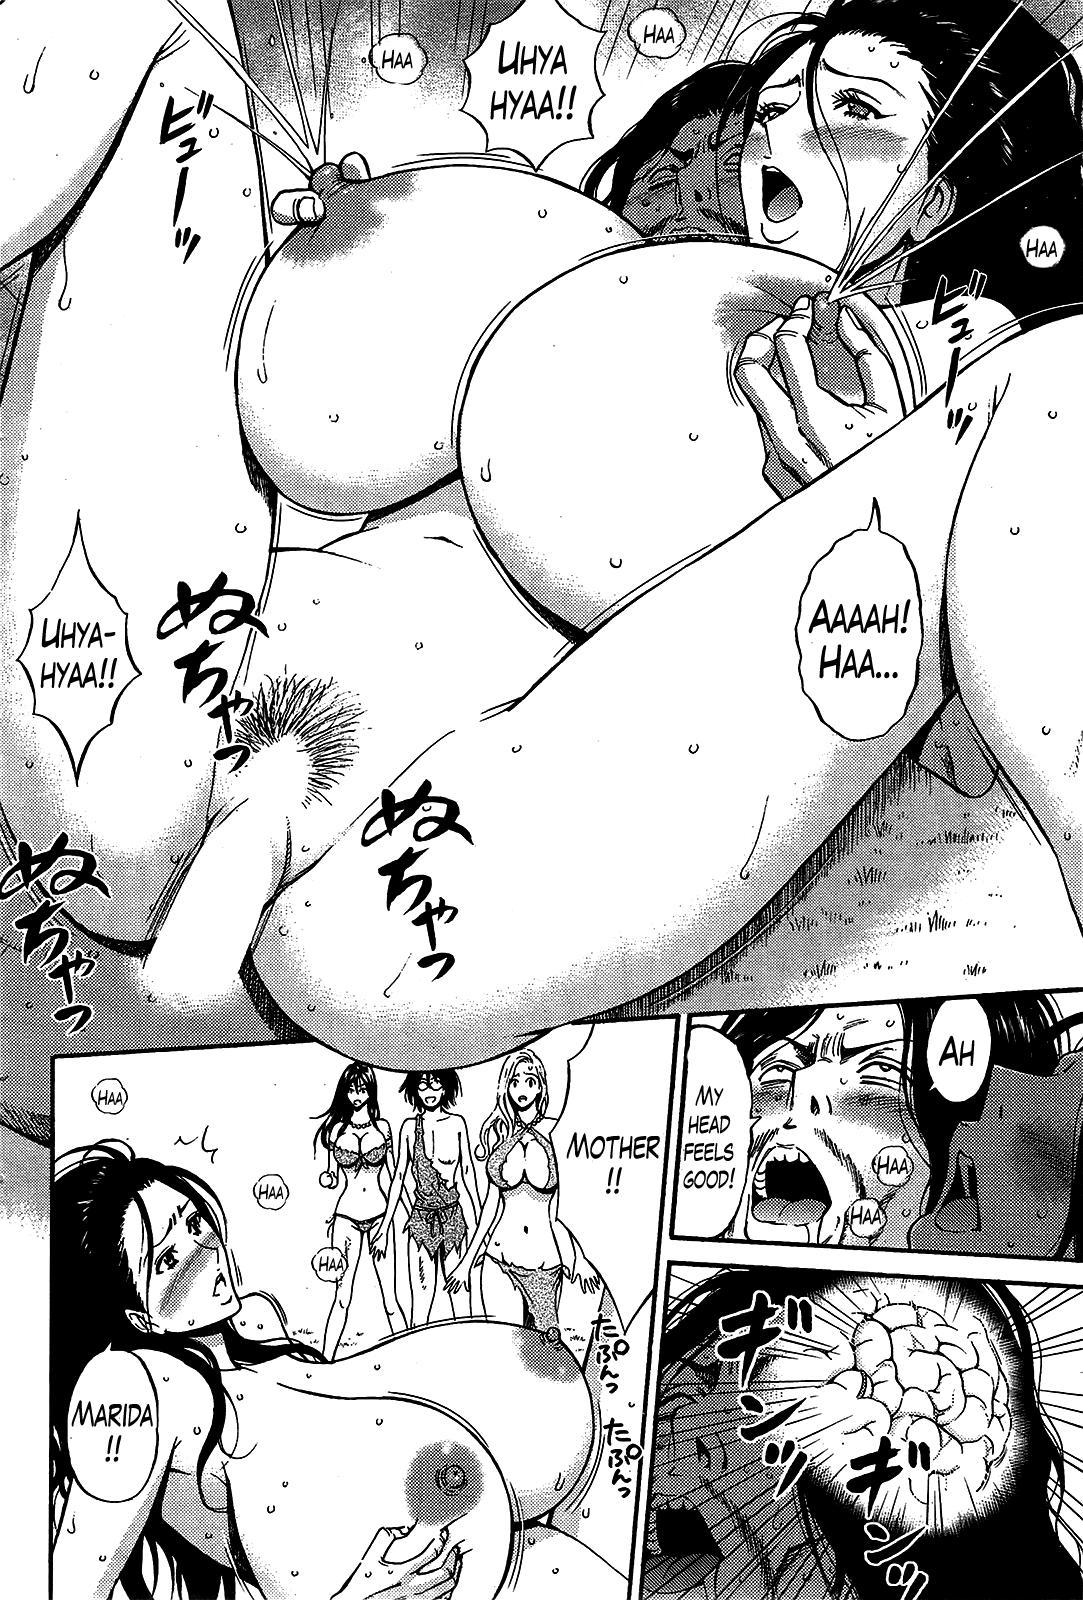 Kigenzen 10000 Nen no Ota   The Otaku in 10,000 B.C. Ch. 1-22 267